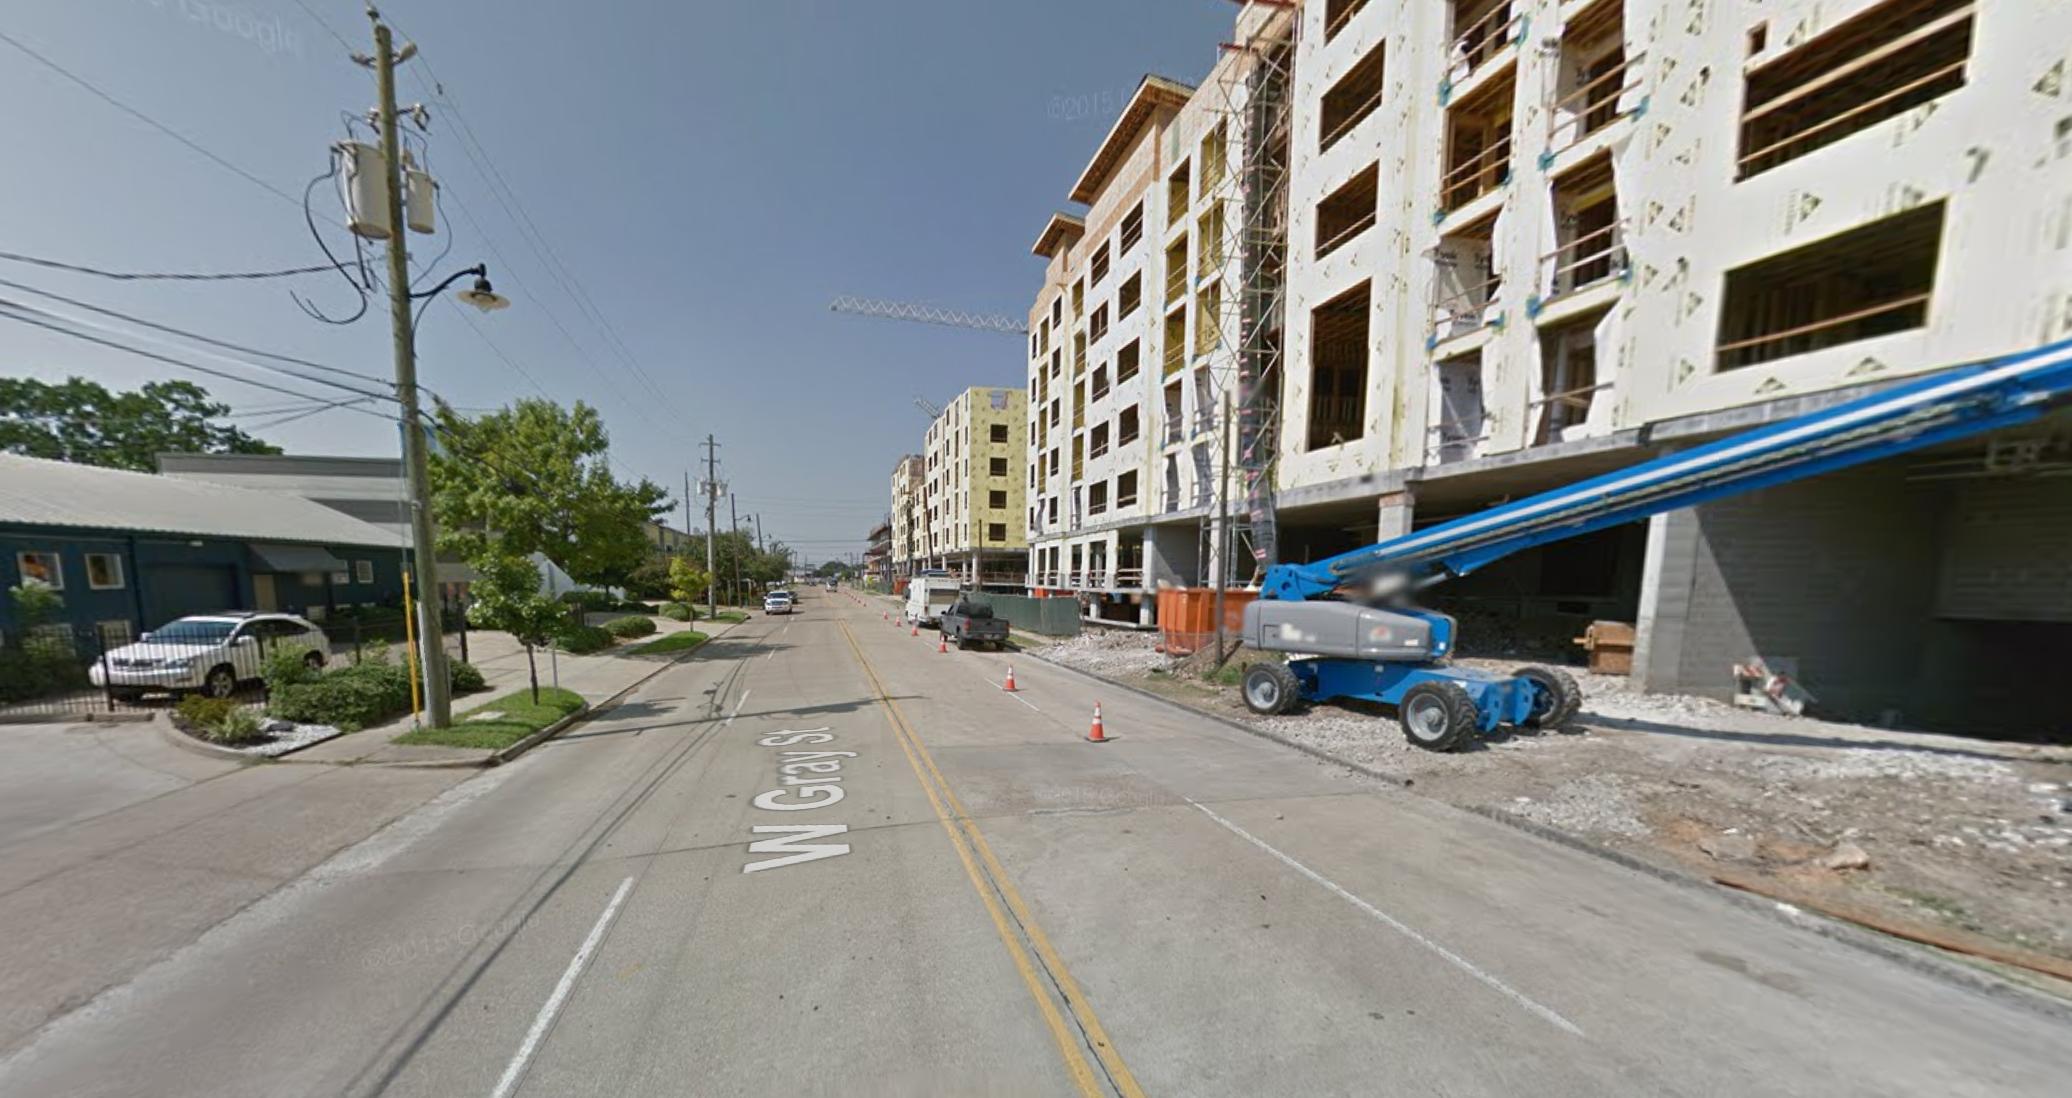 A four-lane road cutting through an urban neighborhood.